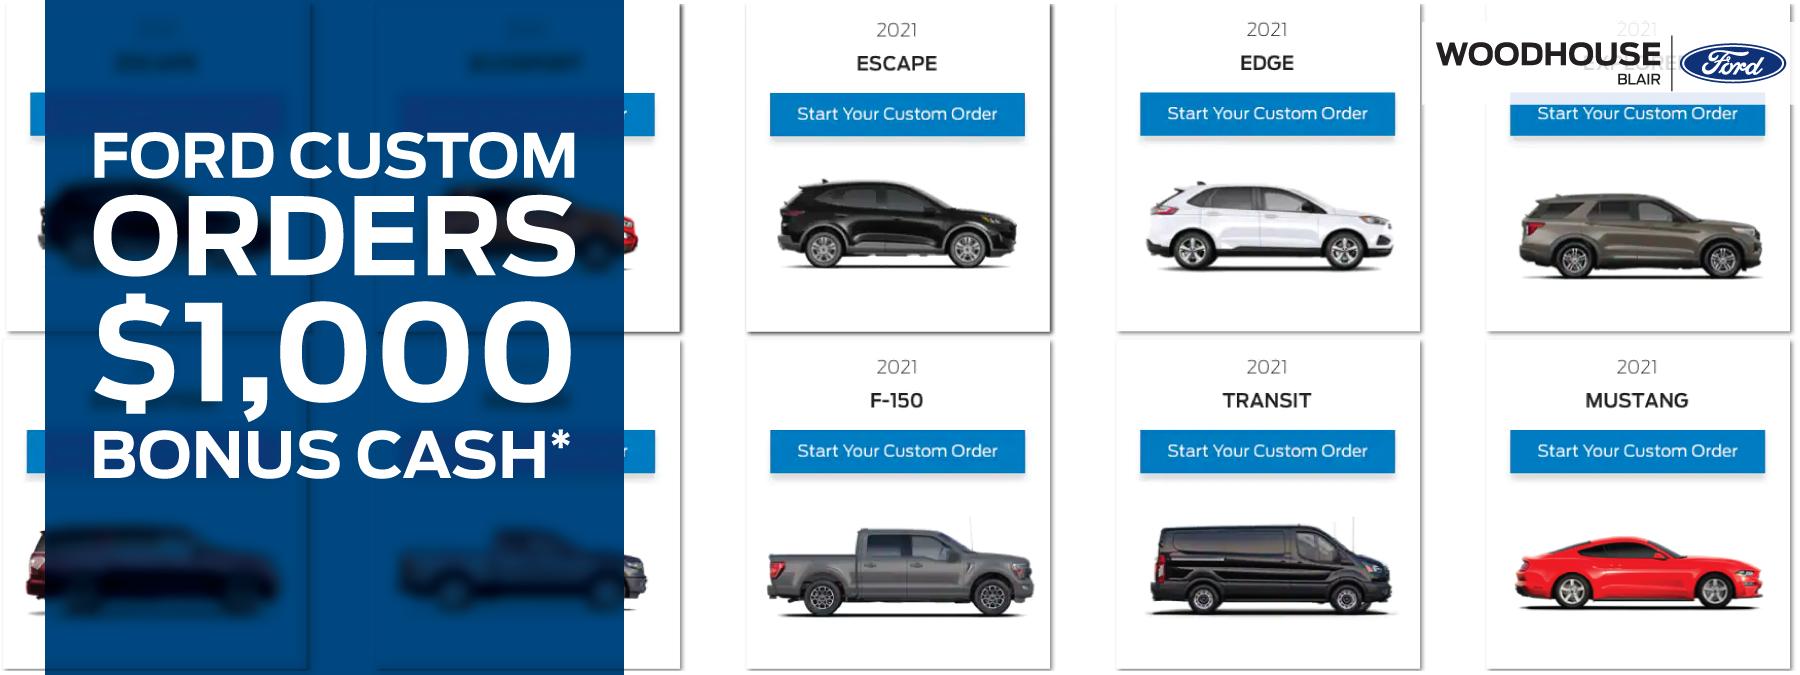 0921-Ford-BLAIR-1000-BONUS-CASH-DESKTOP